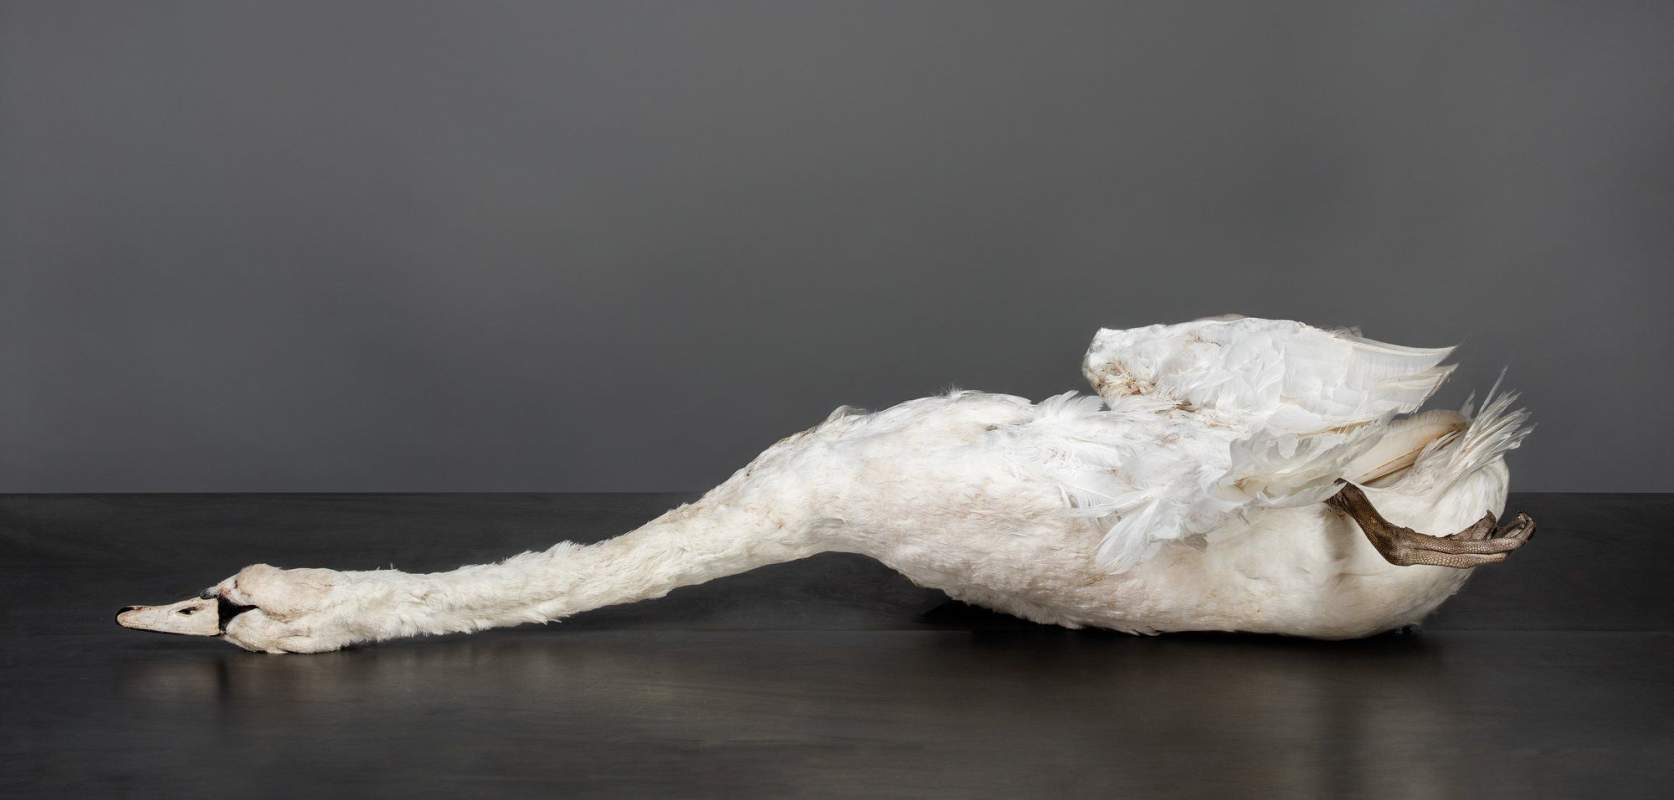 ZWAAN Karin Borghouts 70x145cm 20160411214735